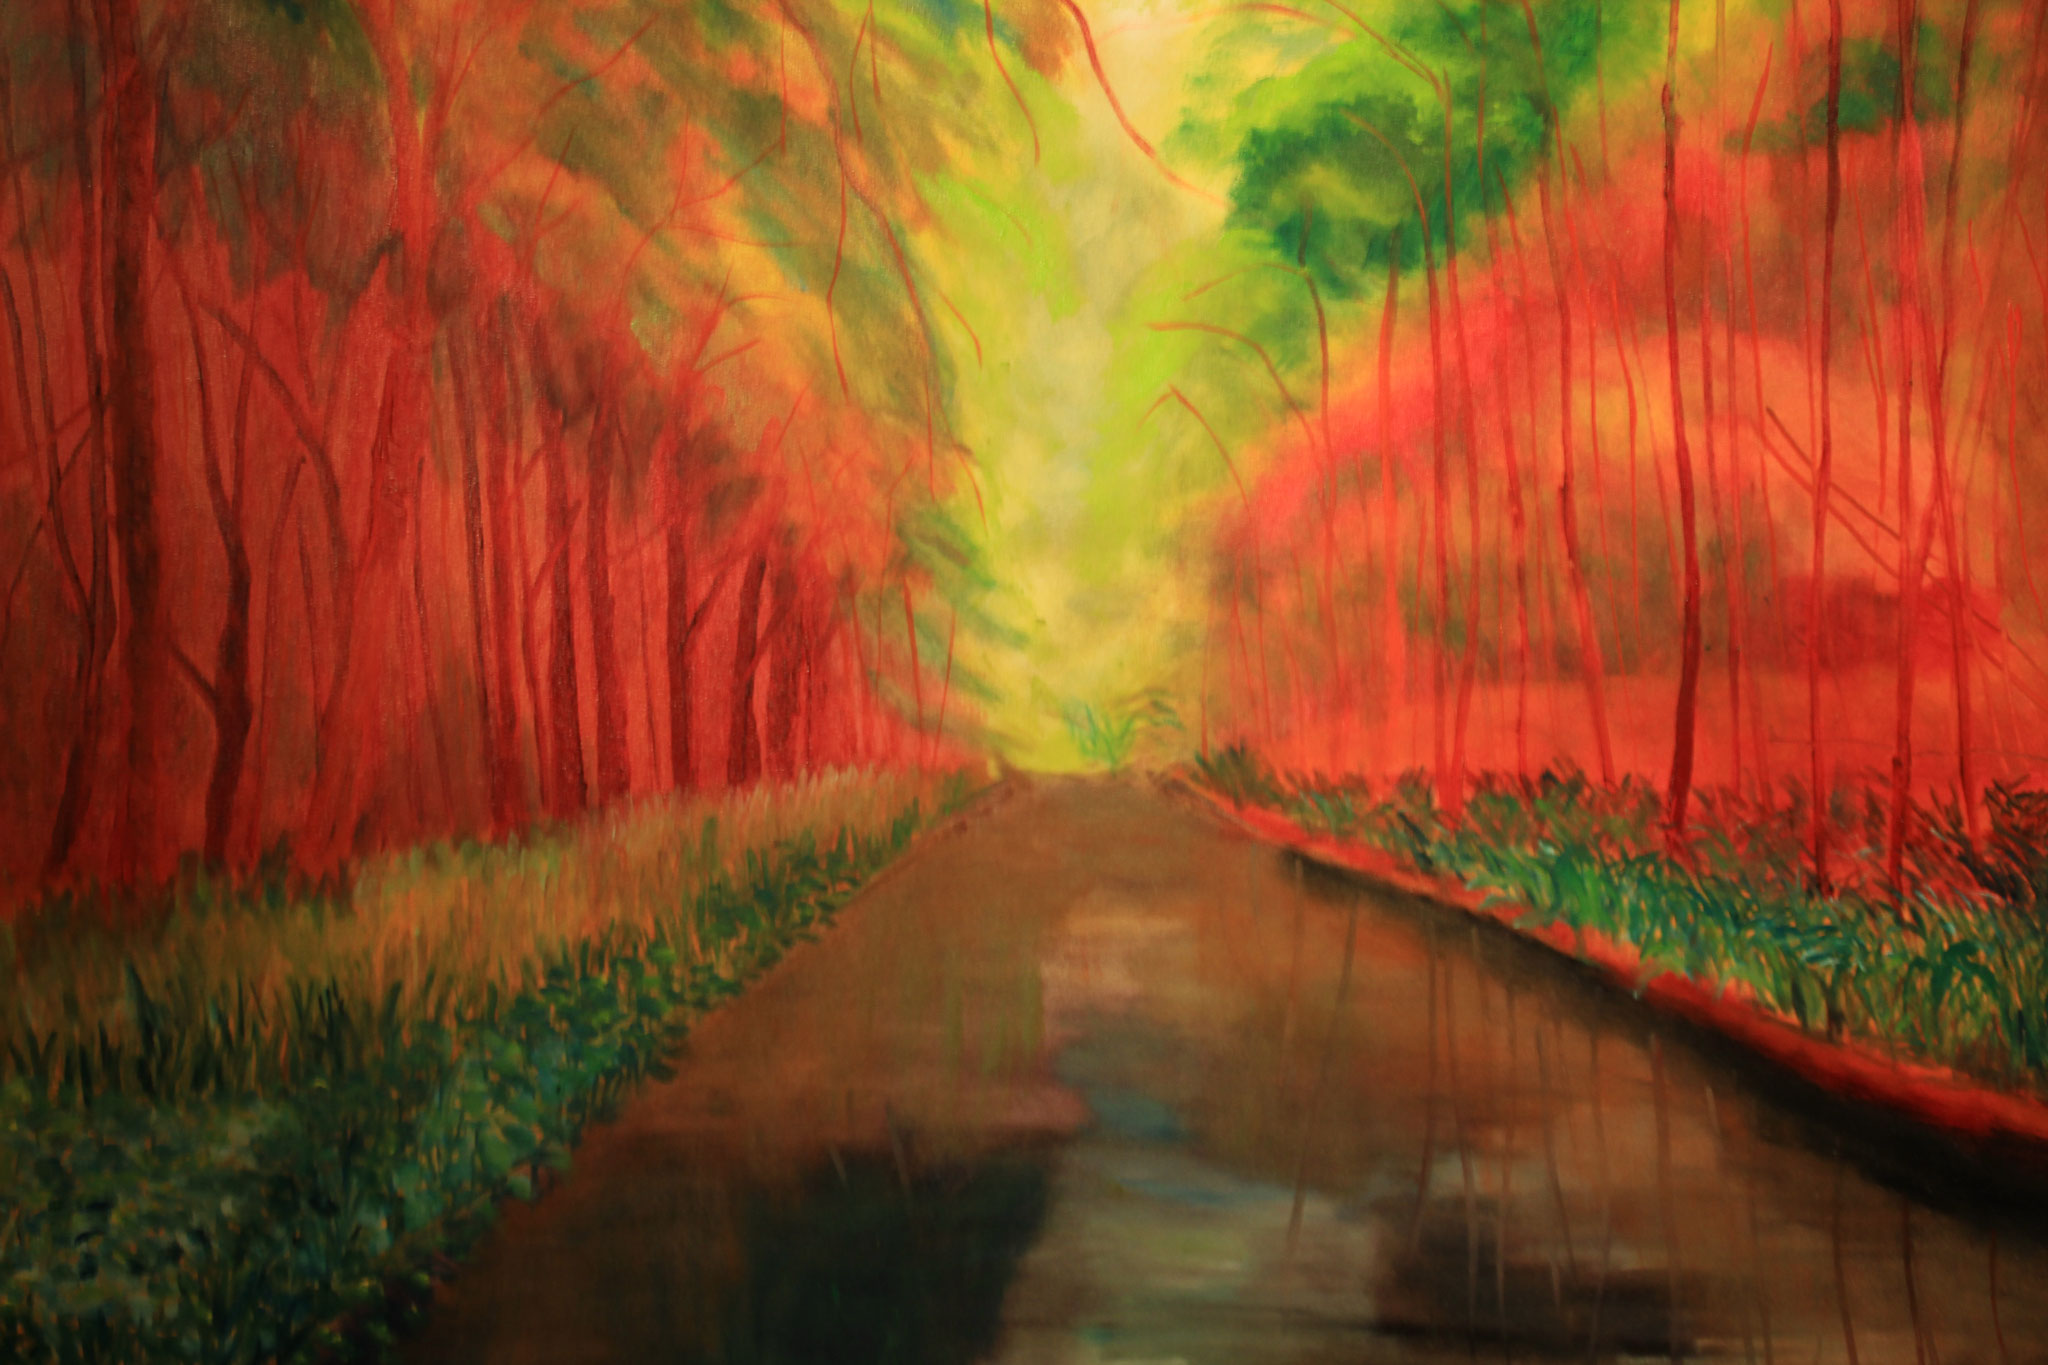 Landgoed Marquette 6, rode bomen, olieverf, 2017 (196)